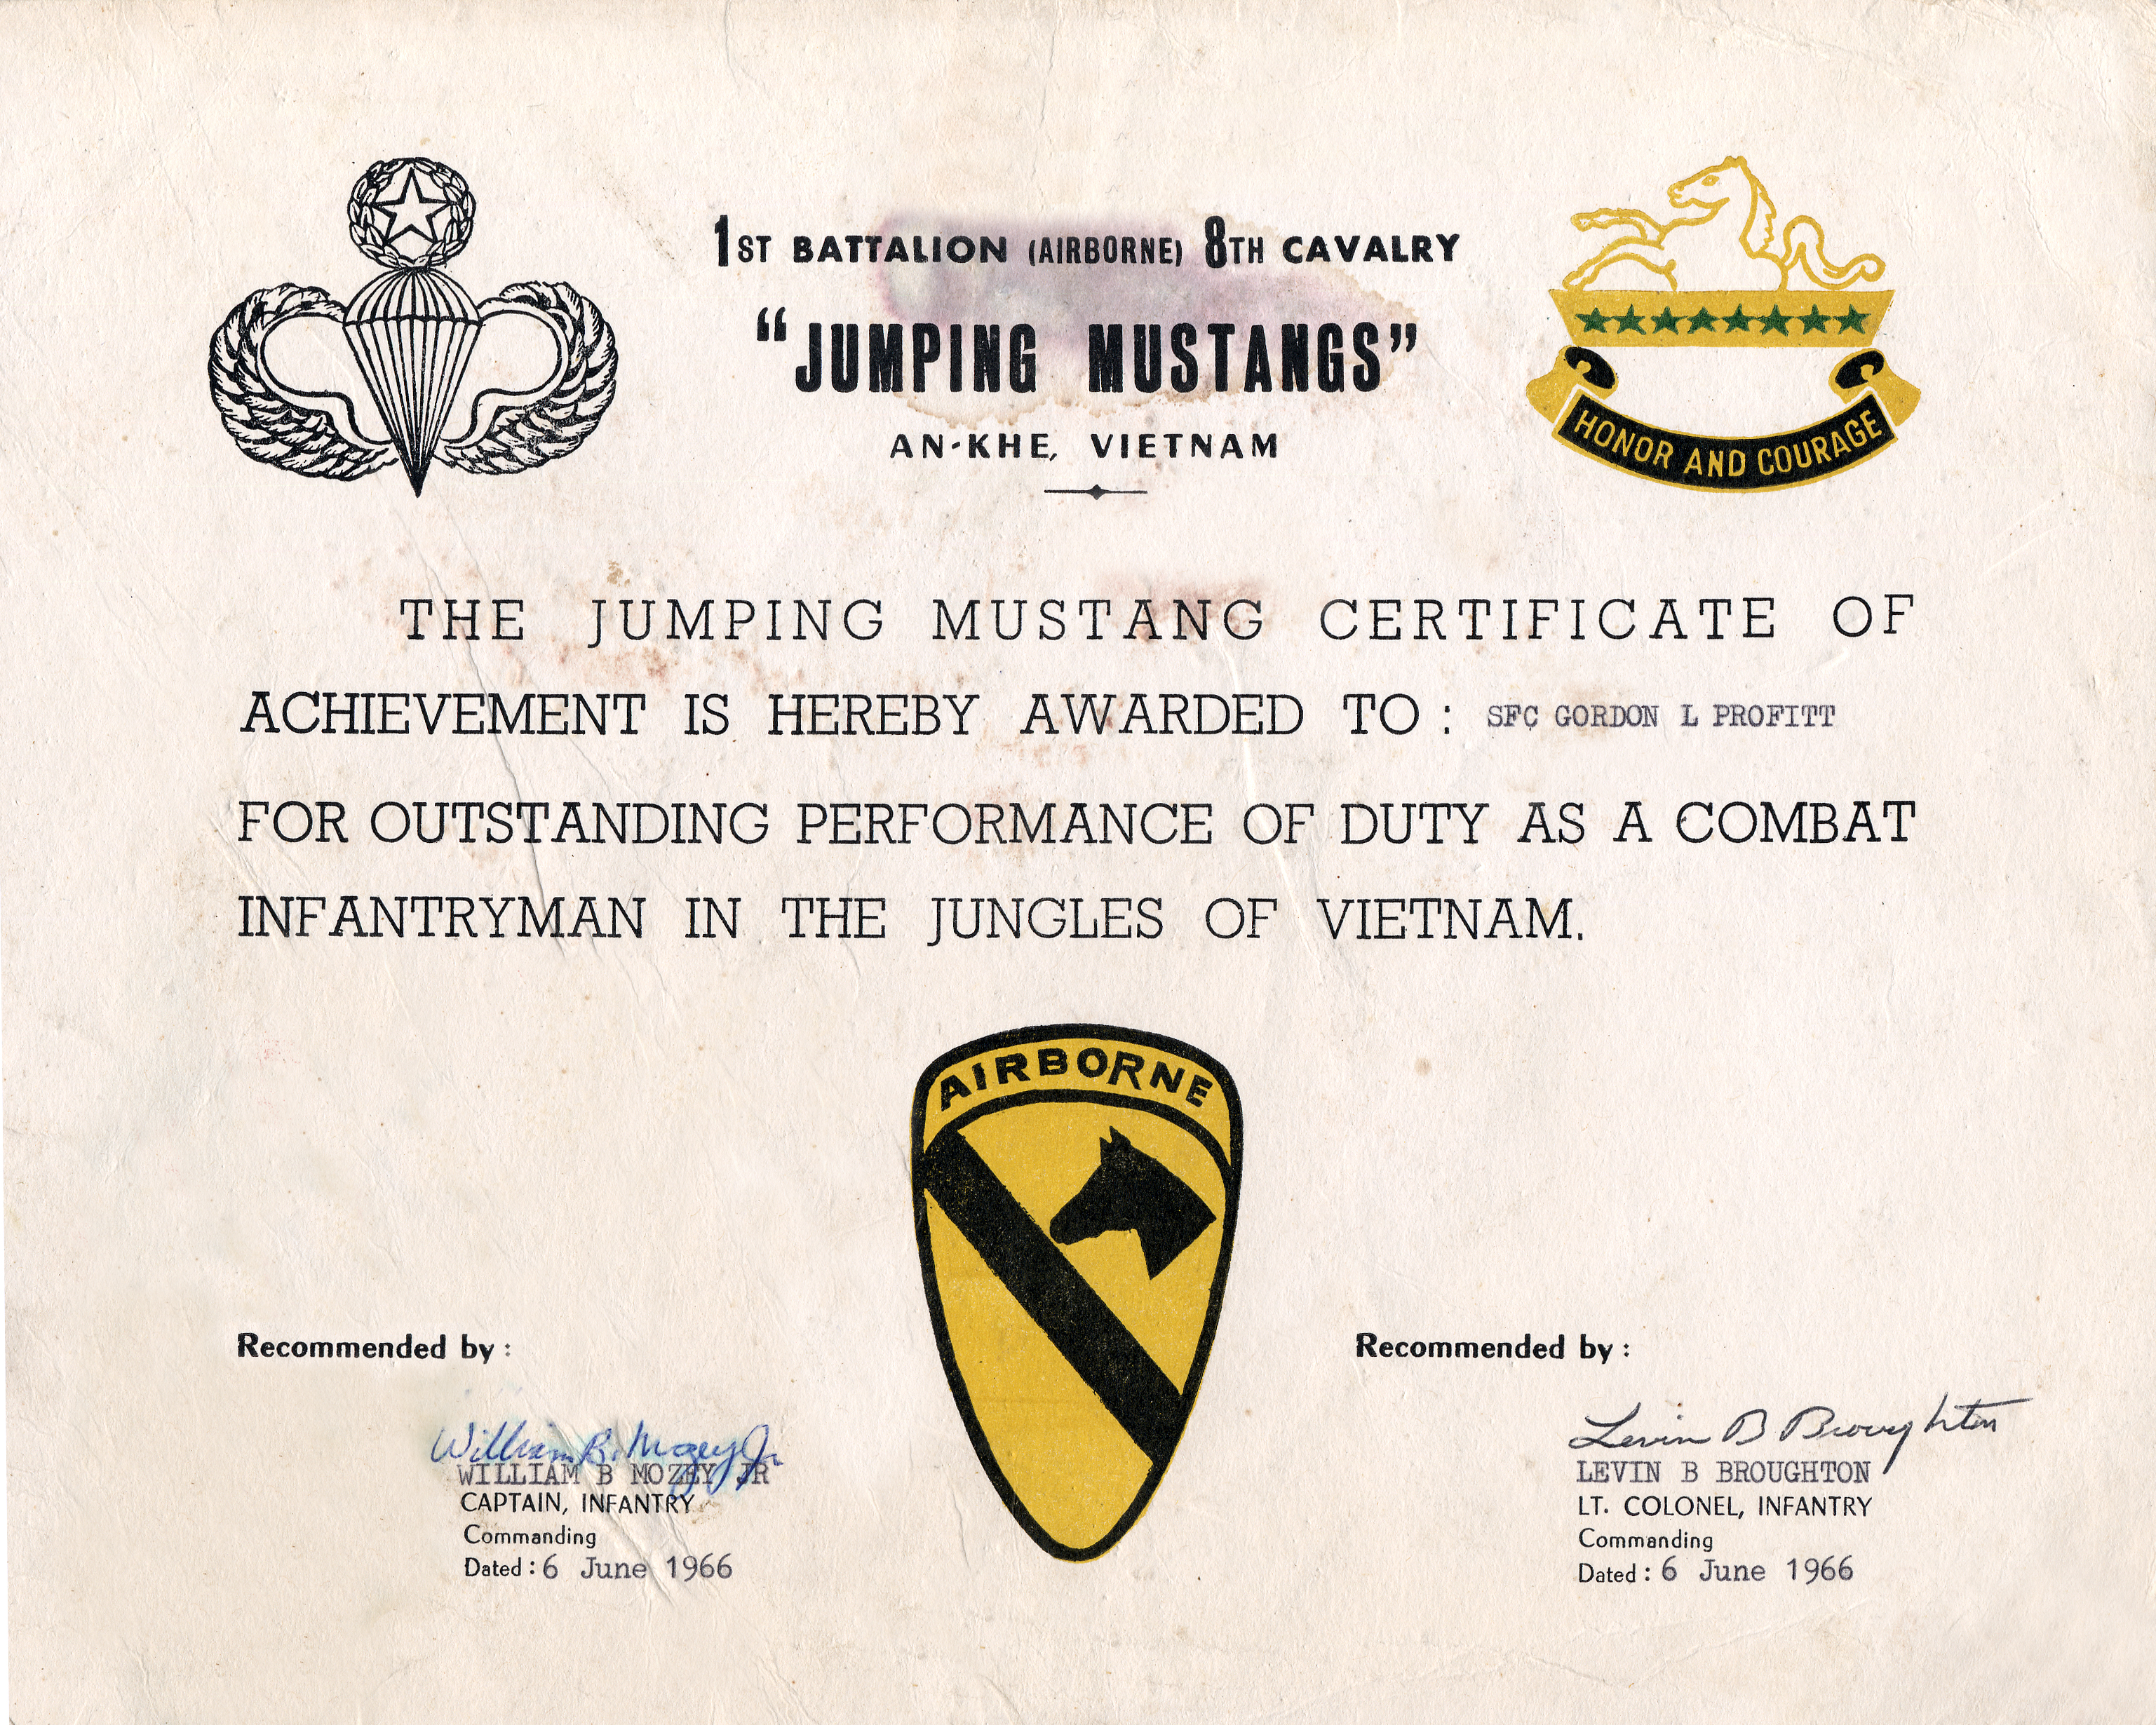 Jumping Mustang Cert.jpg